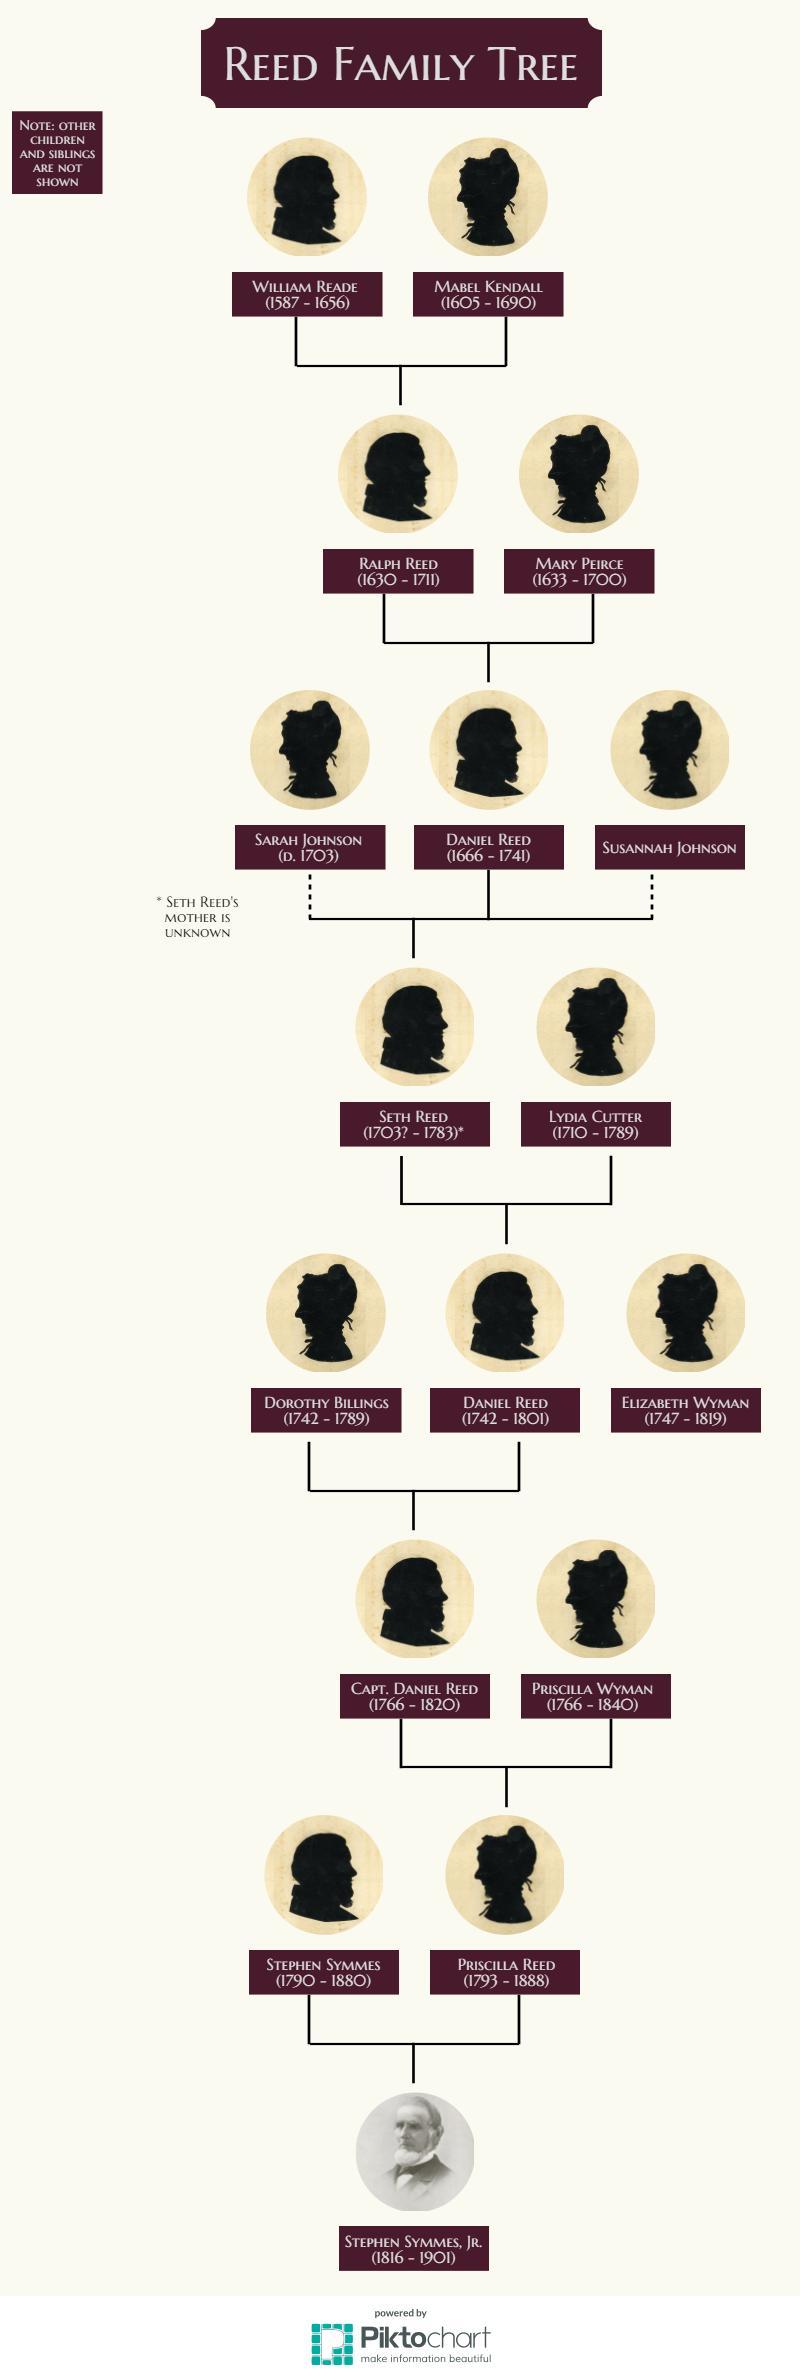 Final Reed Family Tree